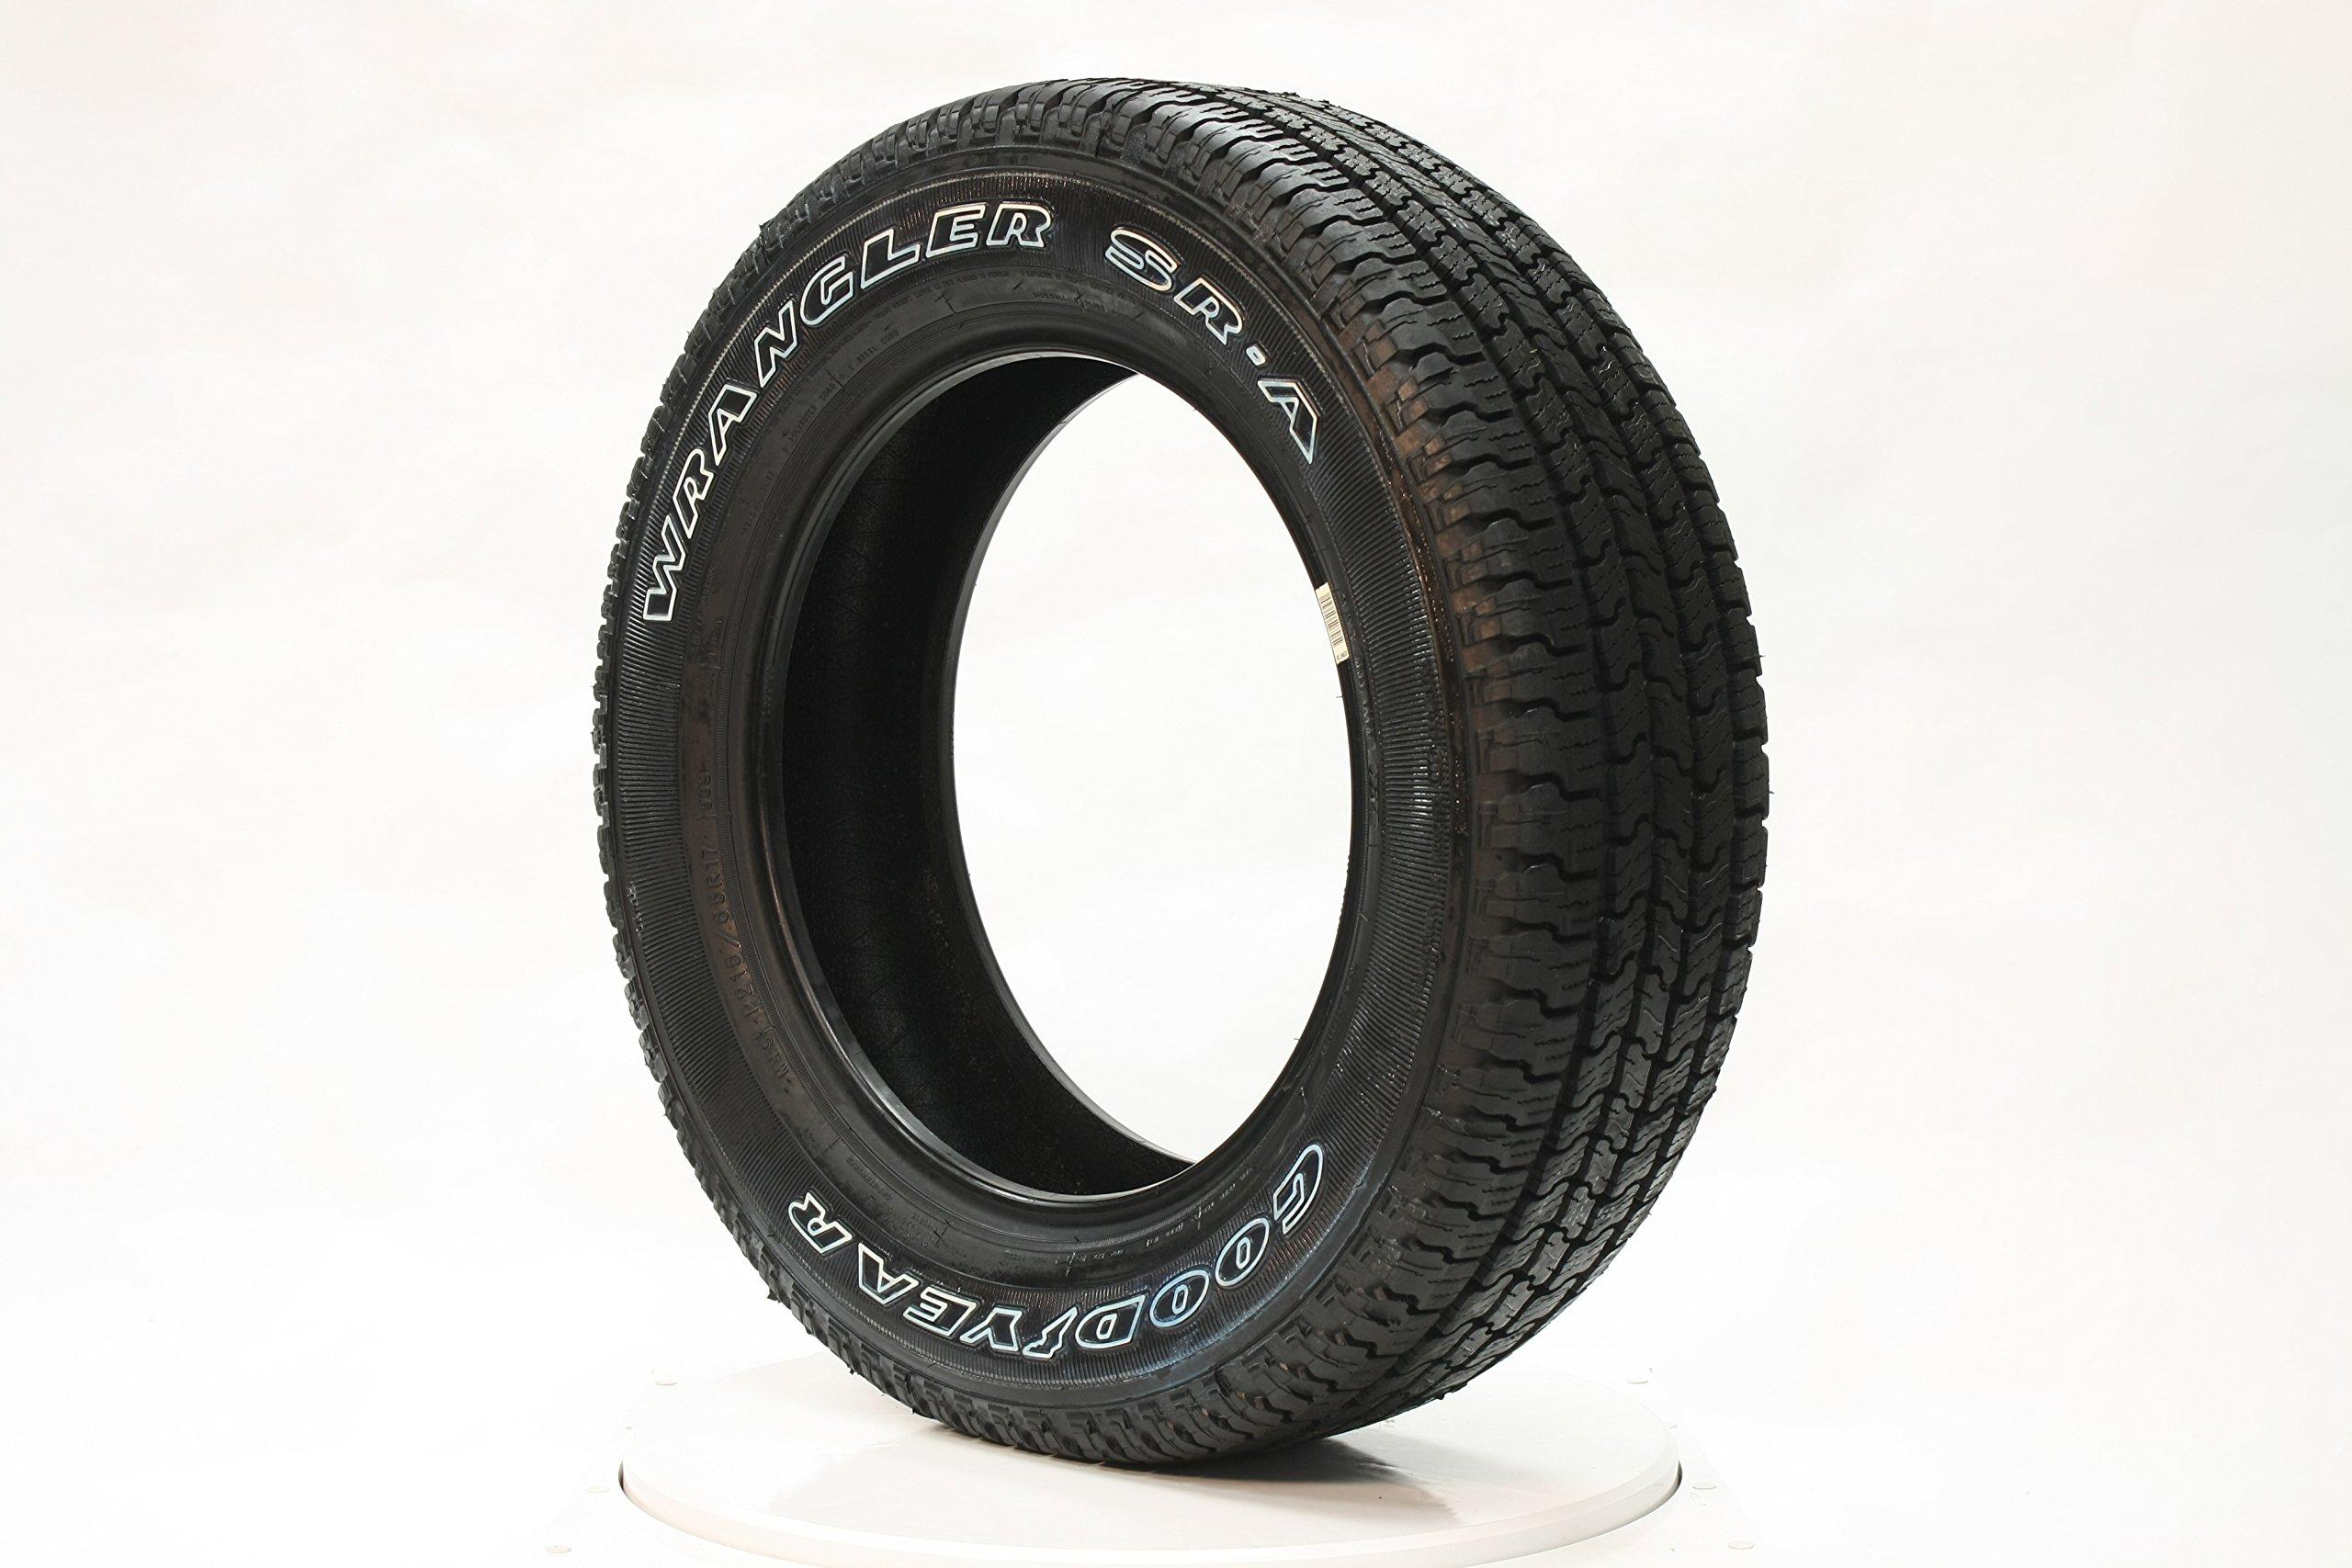 Goodyear Wrangler SR-A Radial Tire – 275/60R20 114S